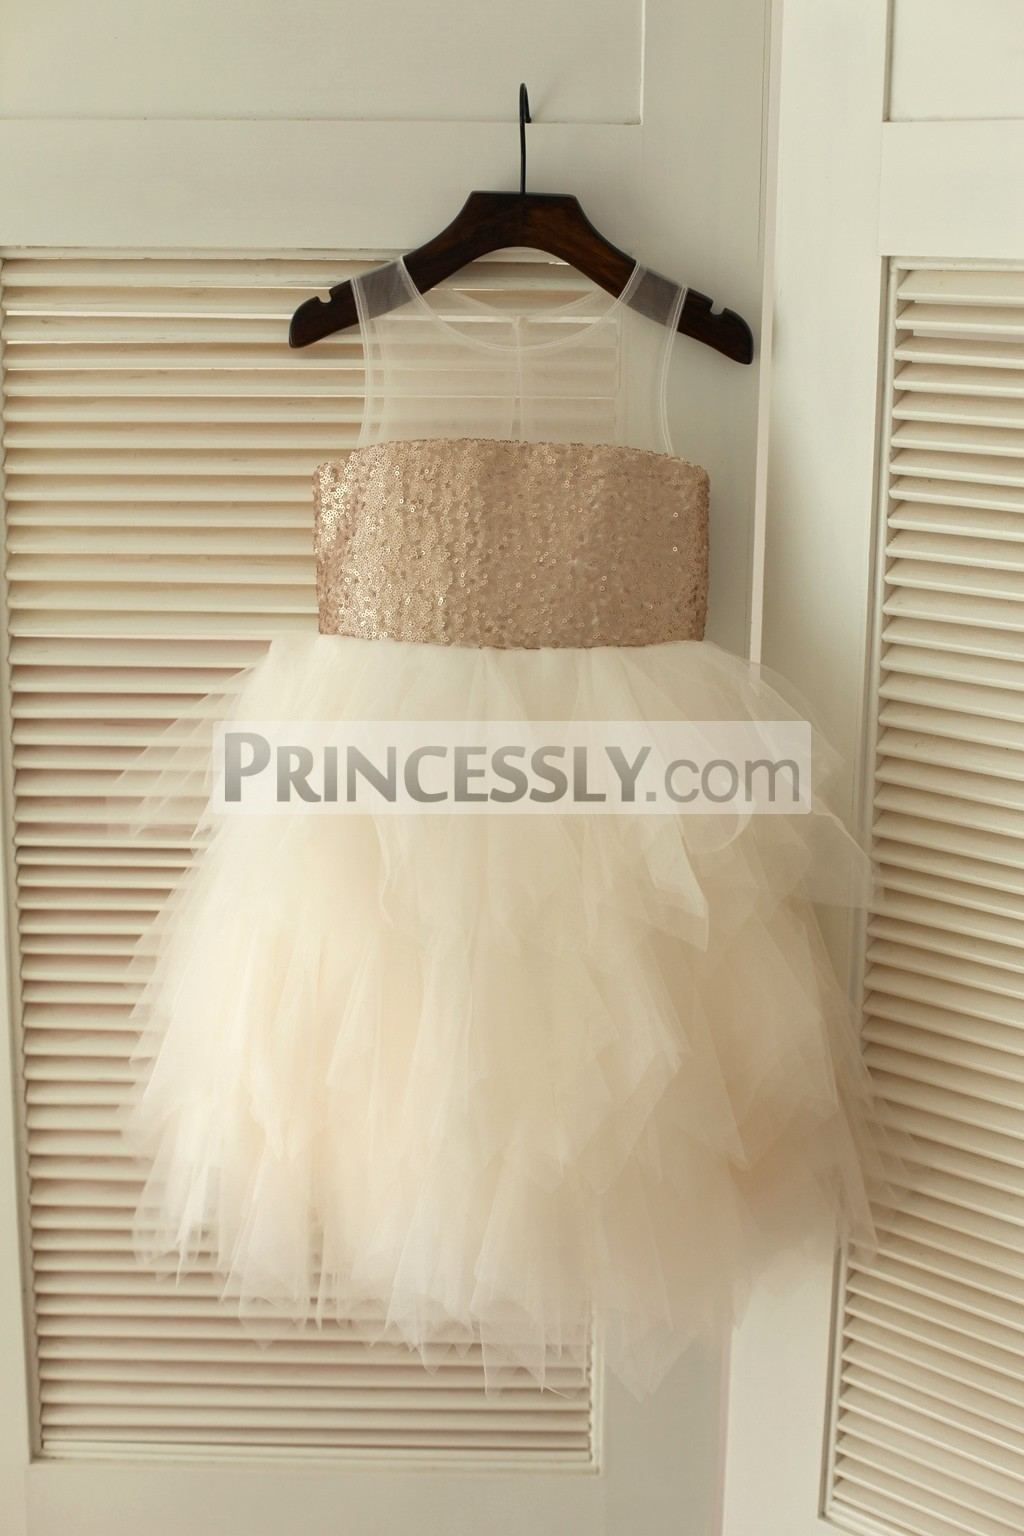 Sheer Neck Champagne Sequins Ivory Feathered Tulle Skirt Flower Girl Dress